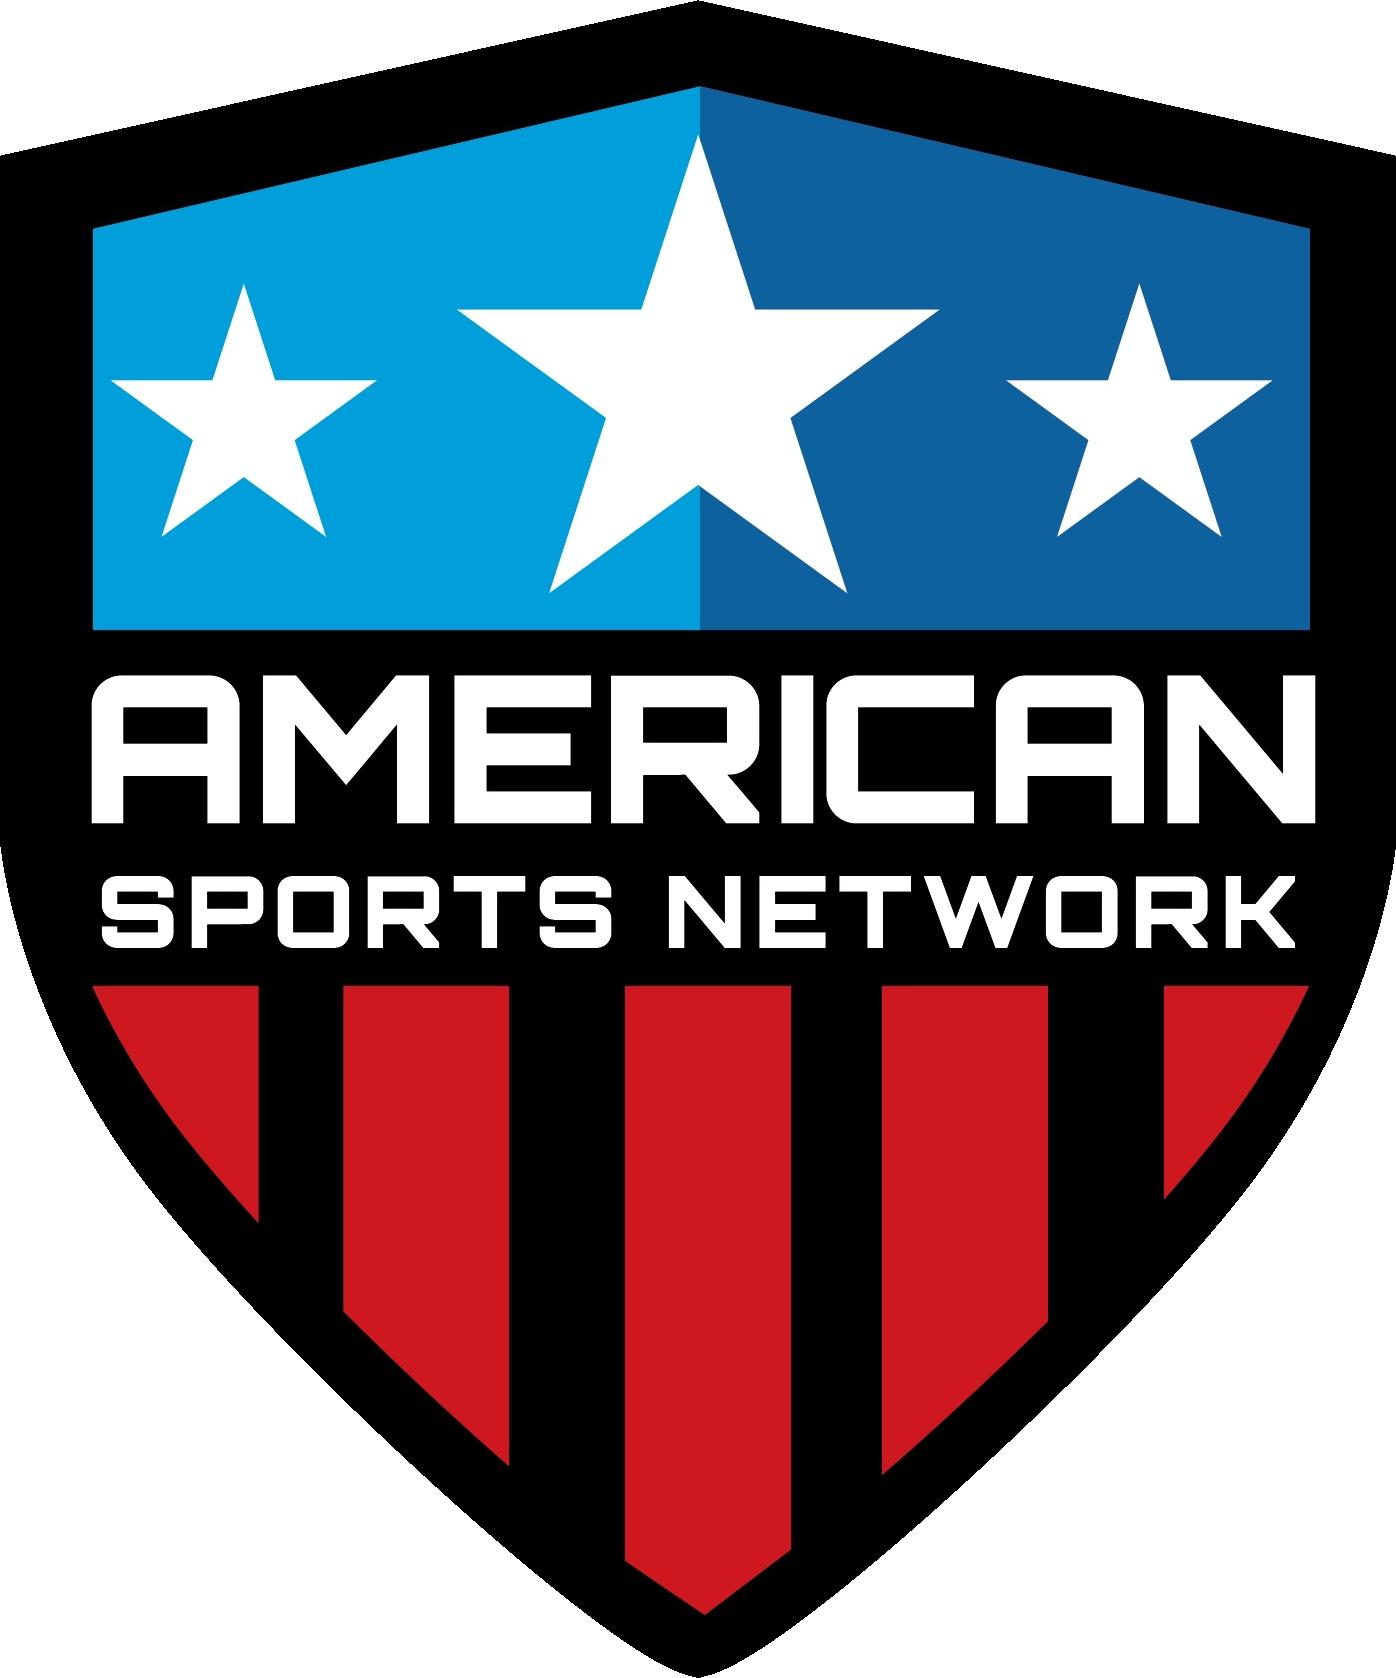 ASL's Sports Profile On Aaron Judge